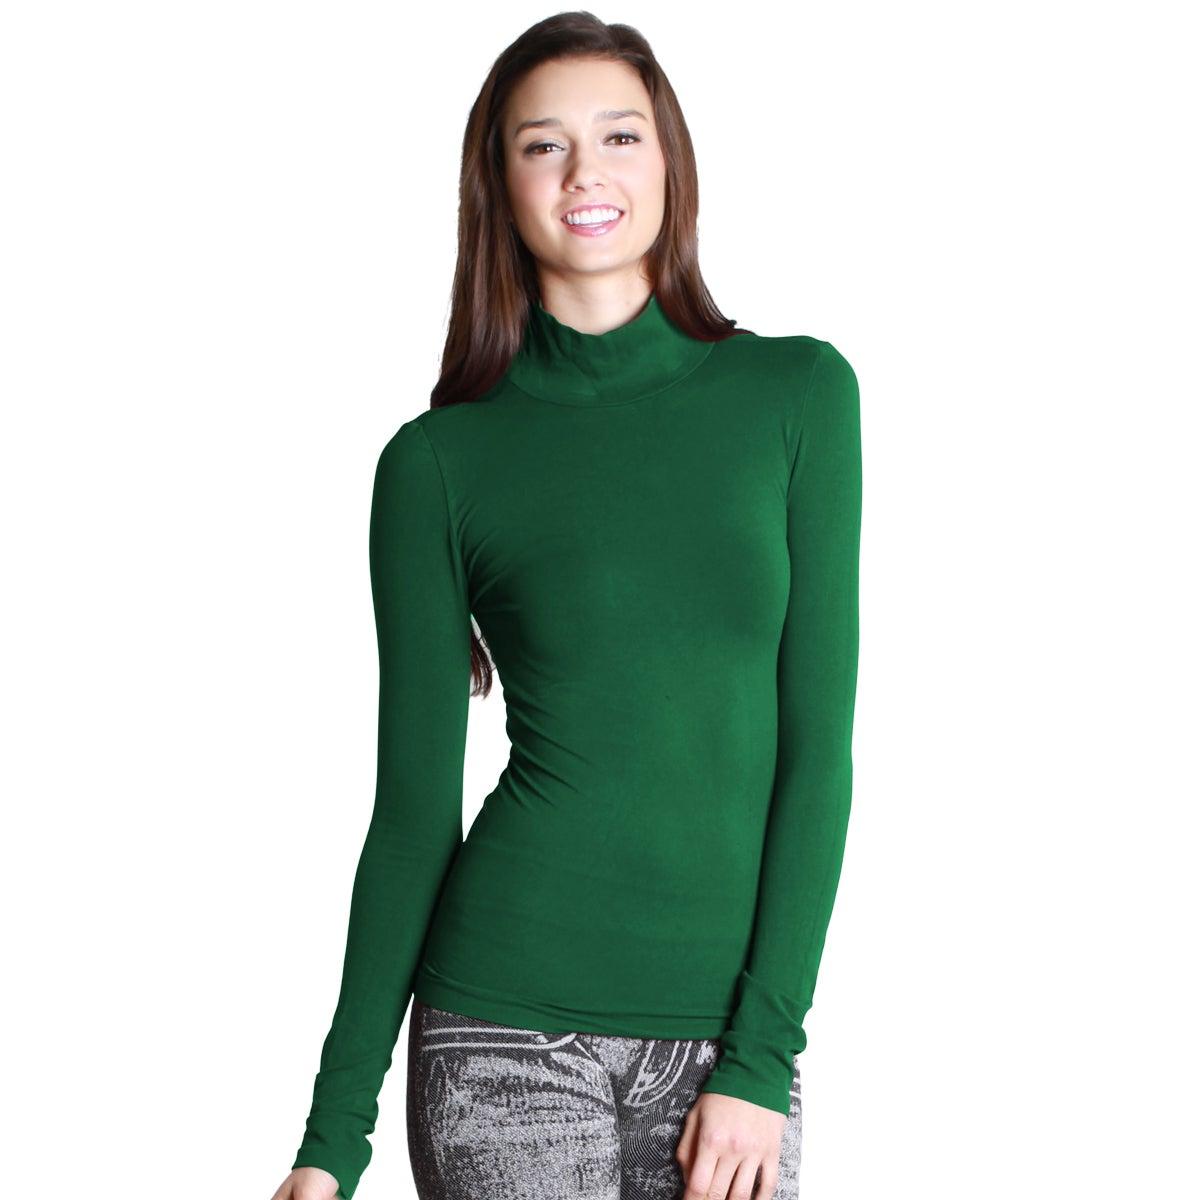 99b1aa08547b45 Shop Nikibiki Women s Seamless Long-Sleeve Mock Neck Top - Free Shipping On  Orders Over  45 - Overstock - 9753197